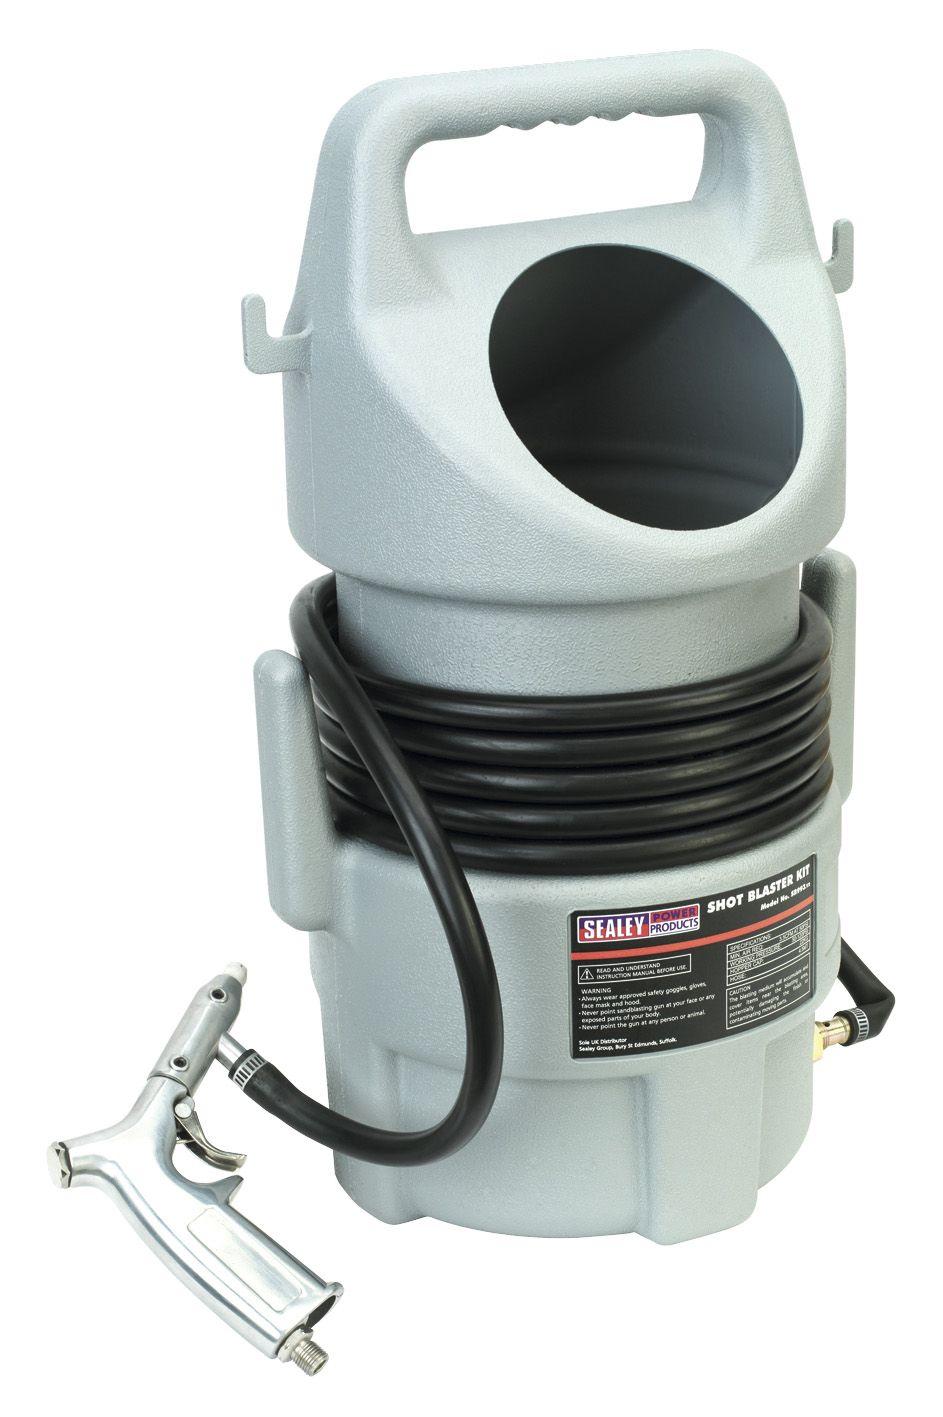 Sealey Shot Blasting Kit 22kg Capacity